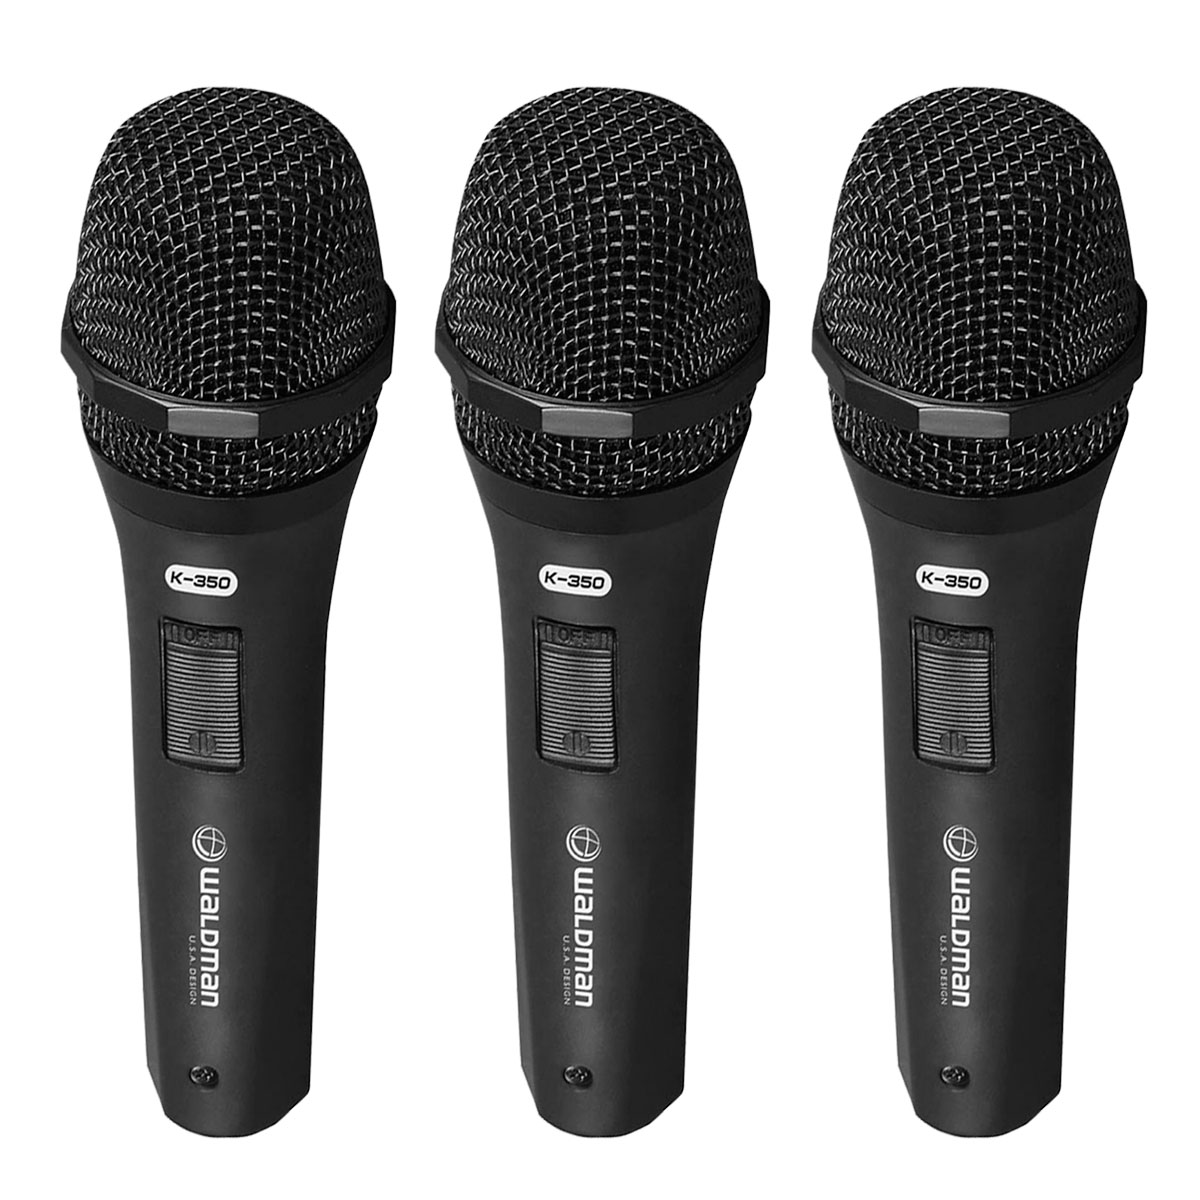 K3503PC - Kit 3 Microfones c/ Fio de Mão K 350 3 PC - Waldman